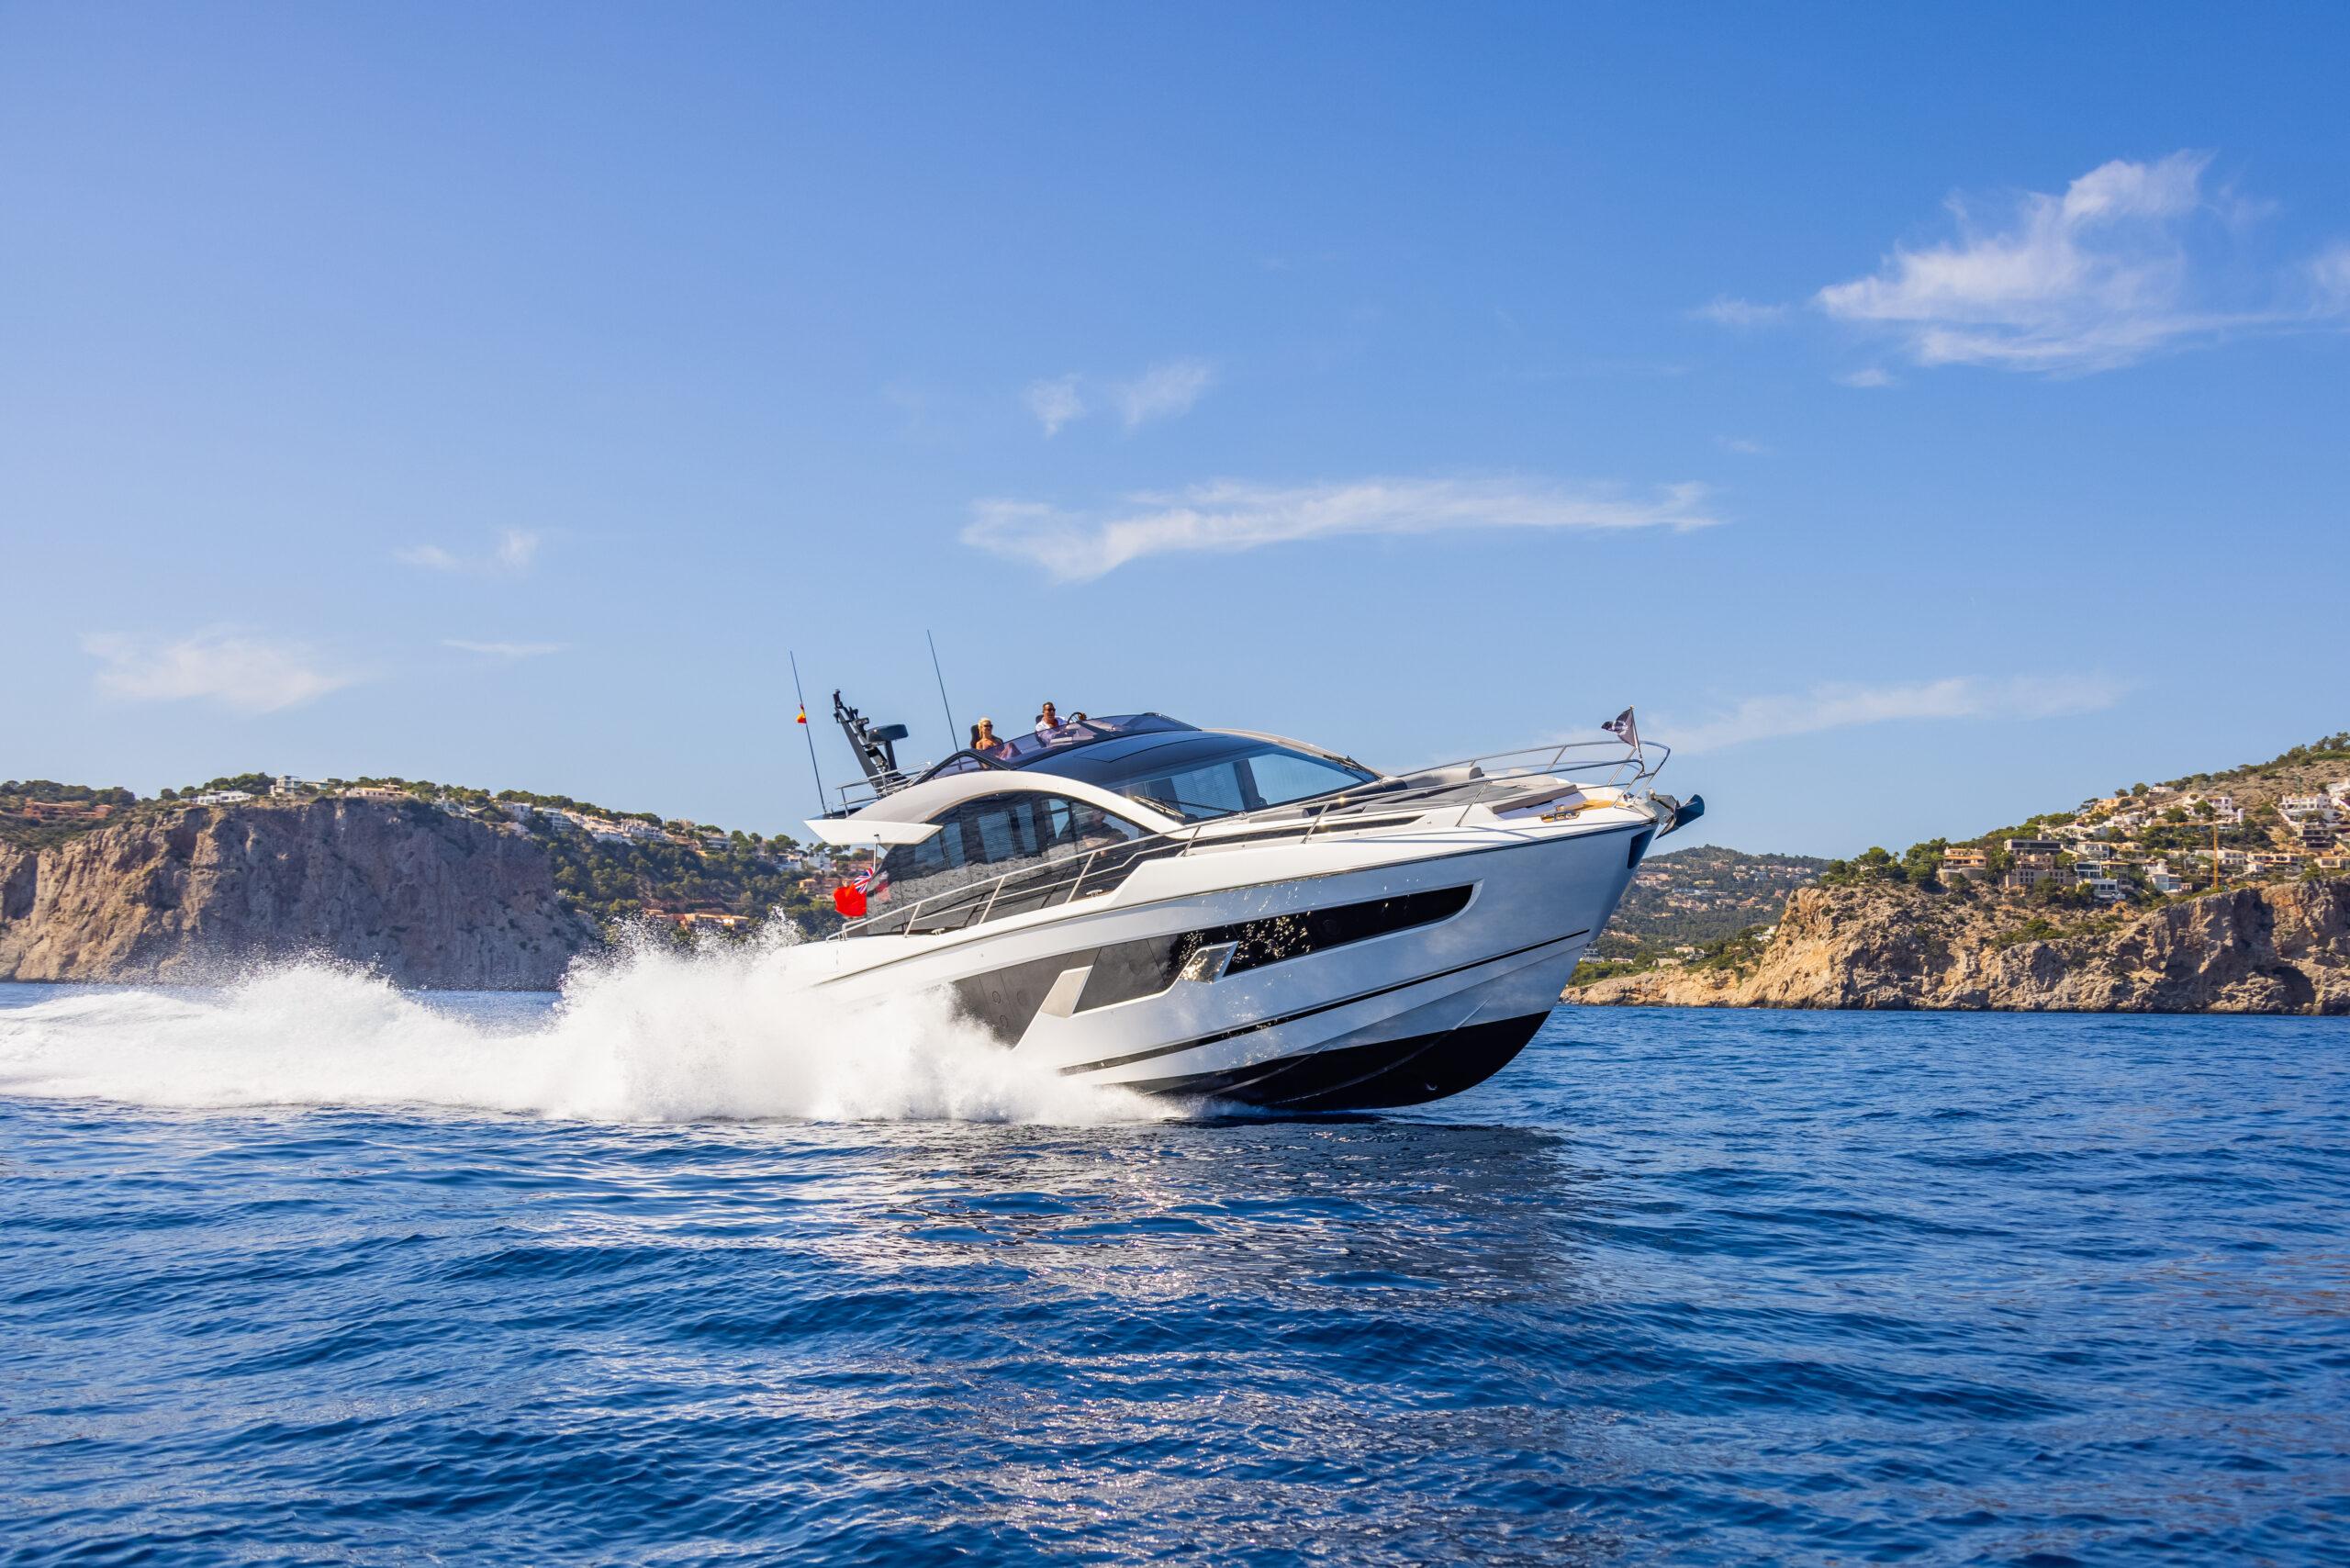 Sunseeker 65 Sport cruising at speed alternate angle